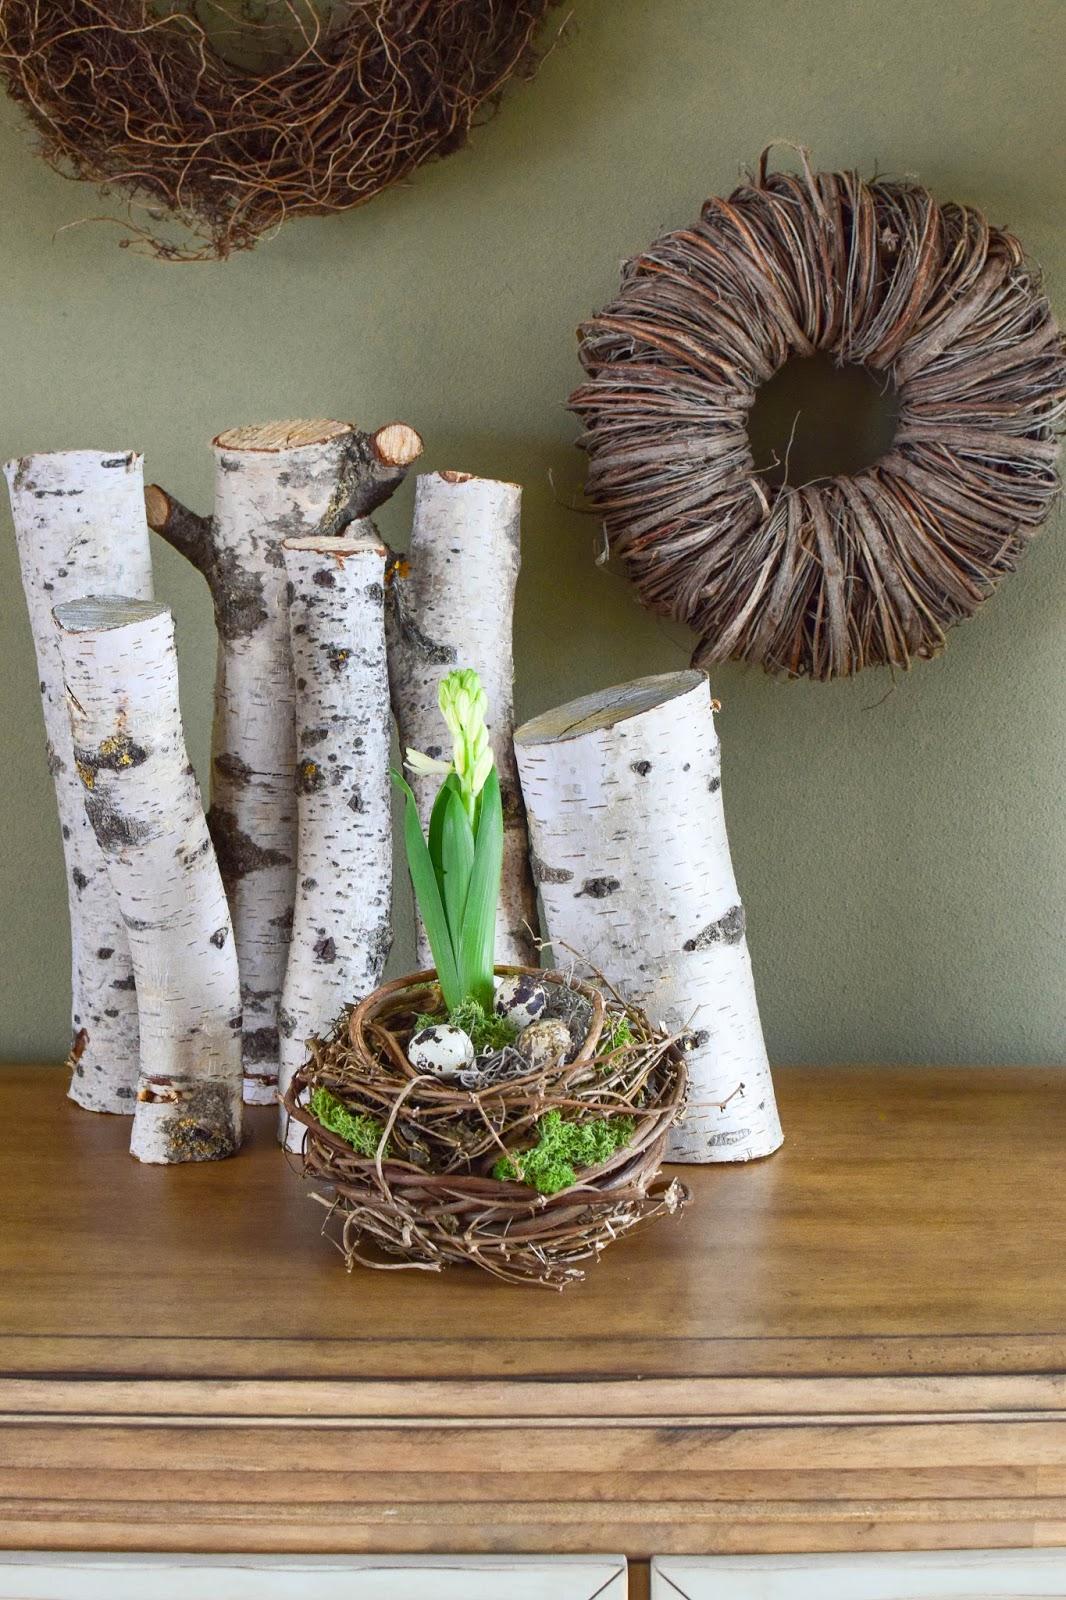 DIY Frühlingsdeko: Frühlingsnest mit Hyazinthe, Moos und Wachteleier, Deko, Dekoidee, Dekoration